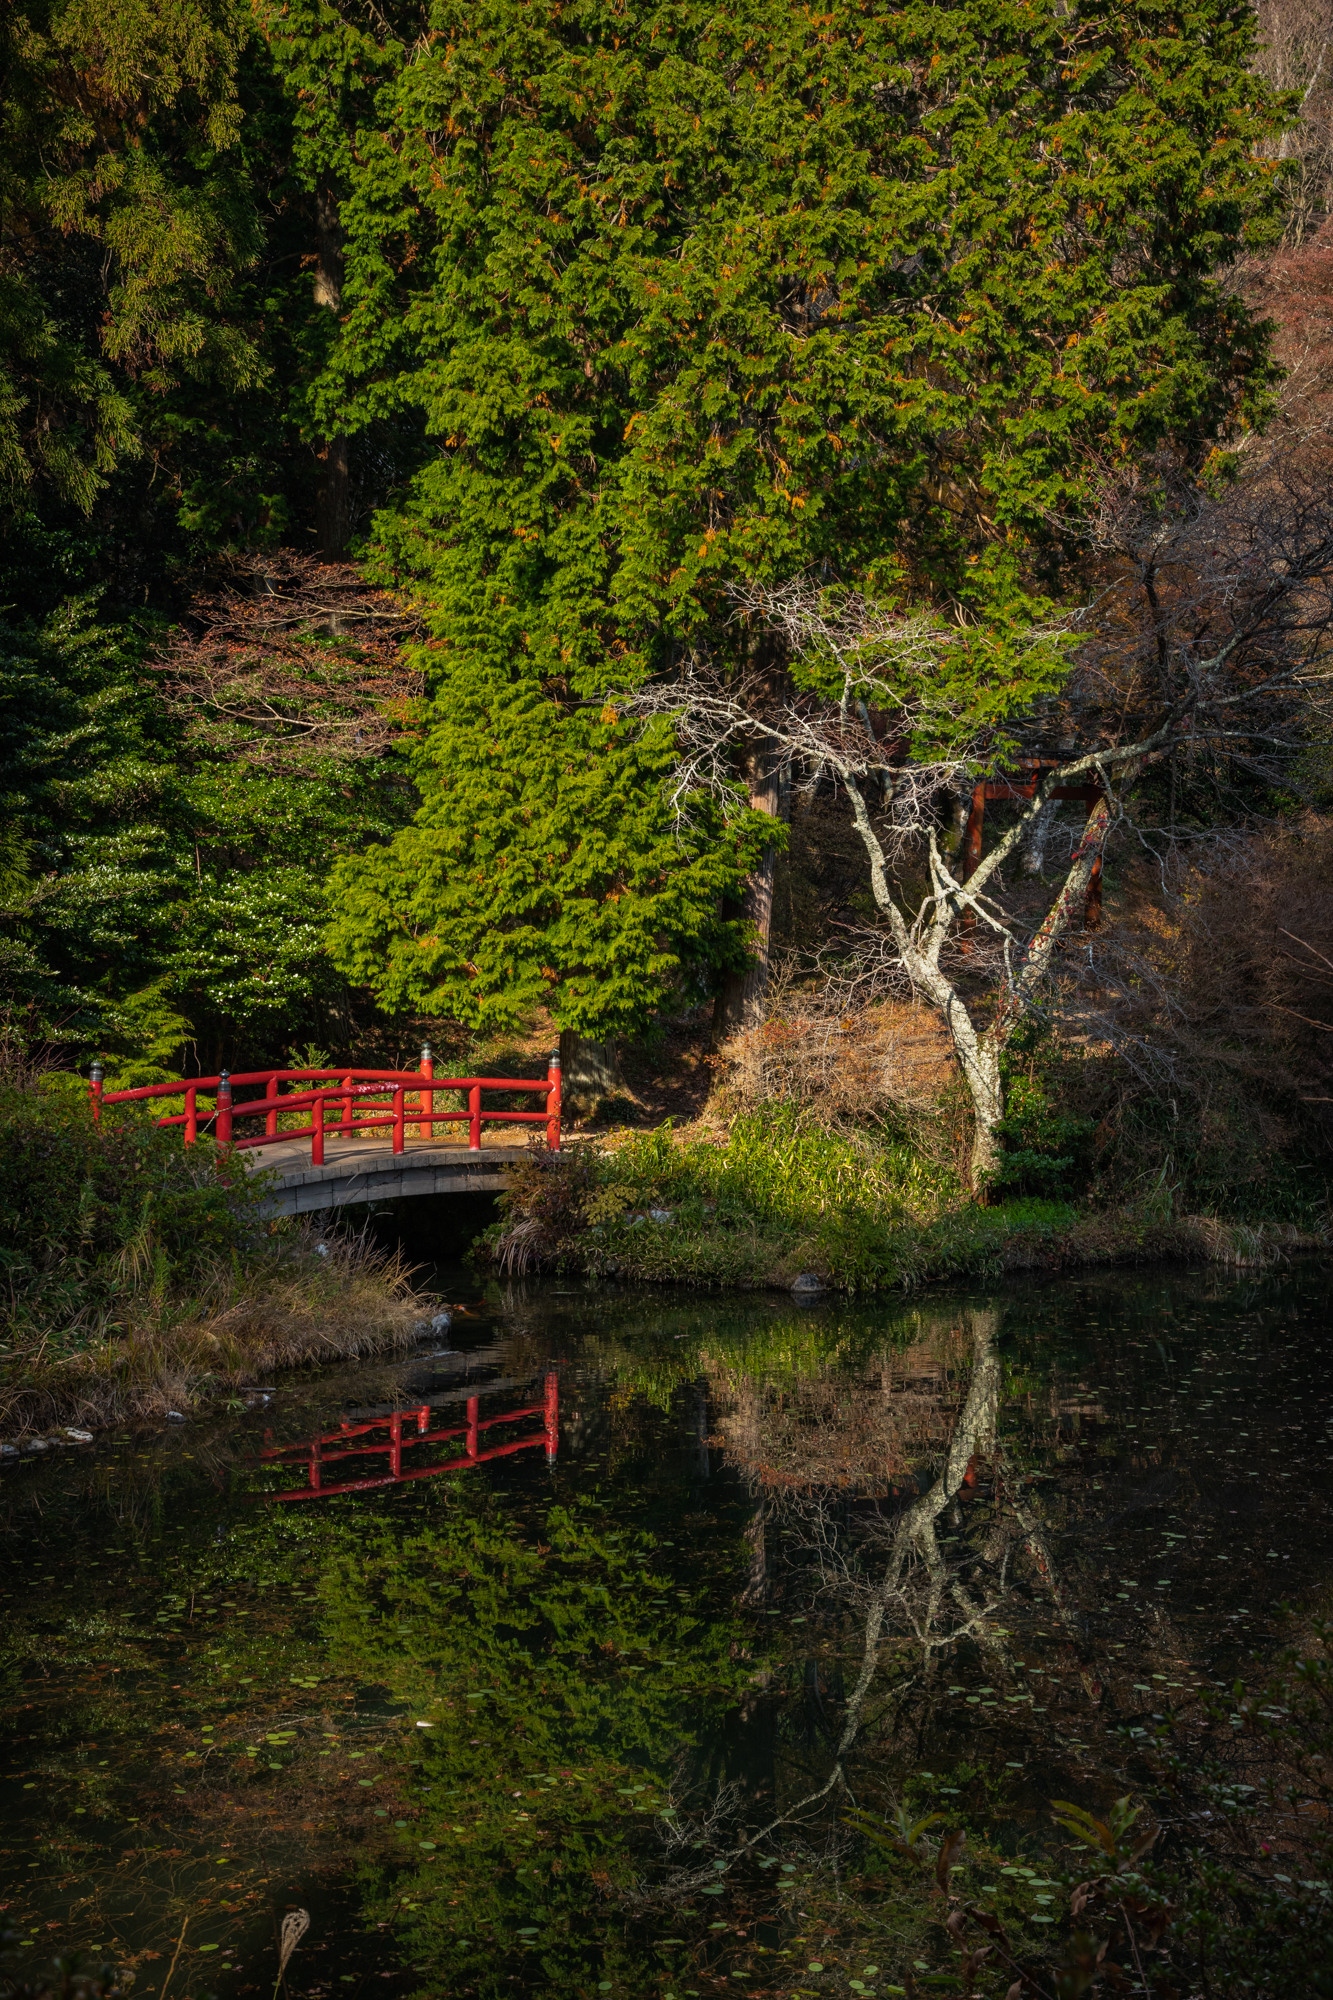 NIKON-CORPORATION_NIKON-D85021925 奈良県  鳥見山公園( 秋におすすめ! 池の赤い橋が美しい紅葉のリフレクション景色! 撮影した写真の紹介、 アクセス情報や撮影ポイントなど!)